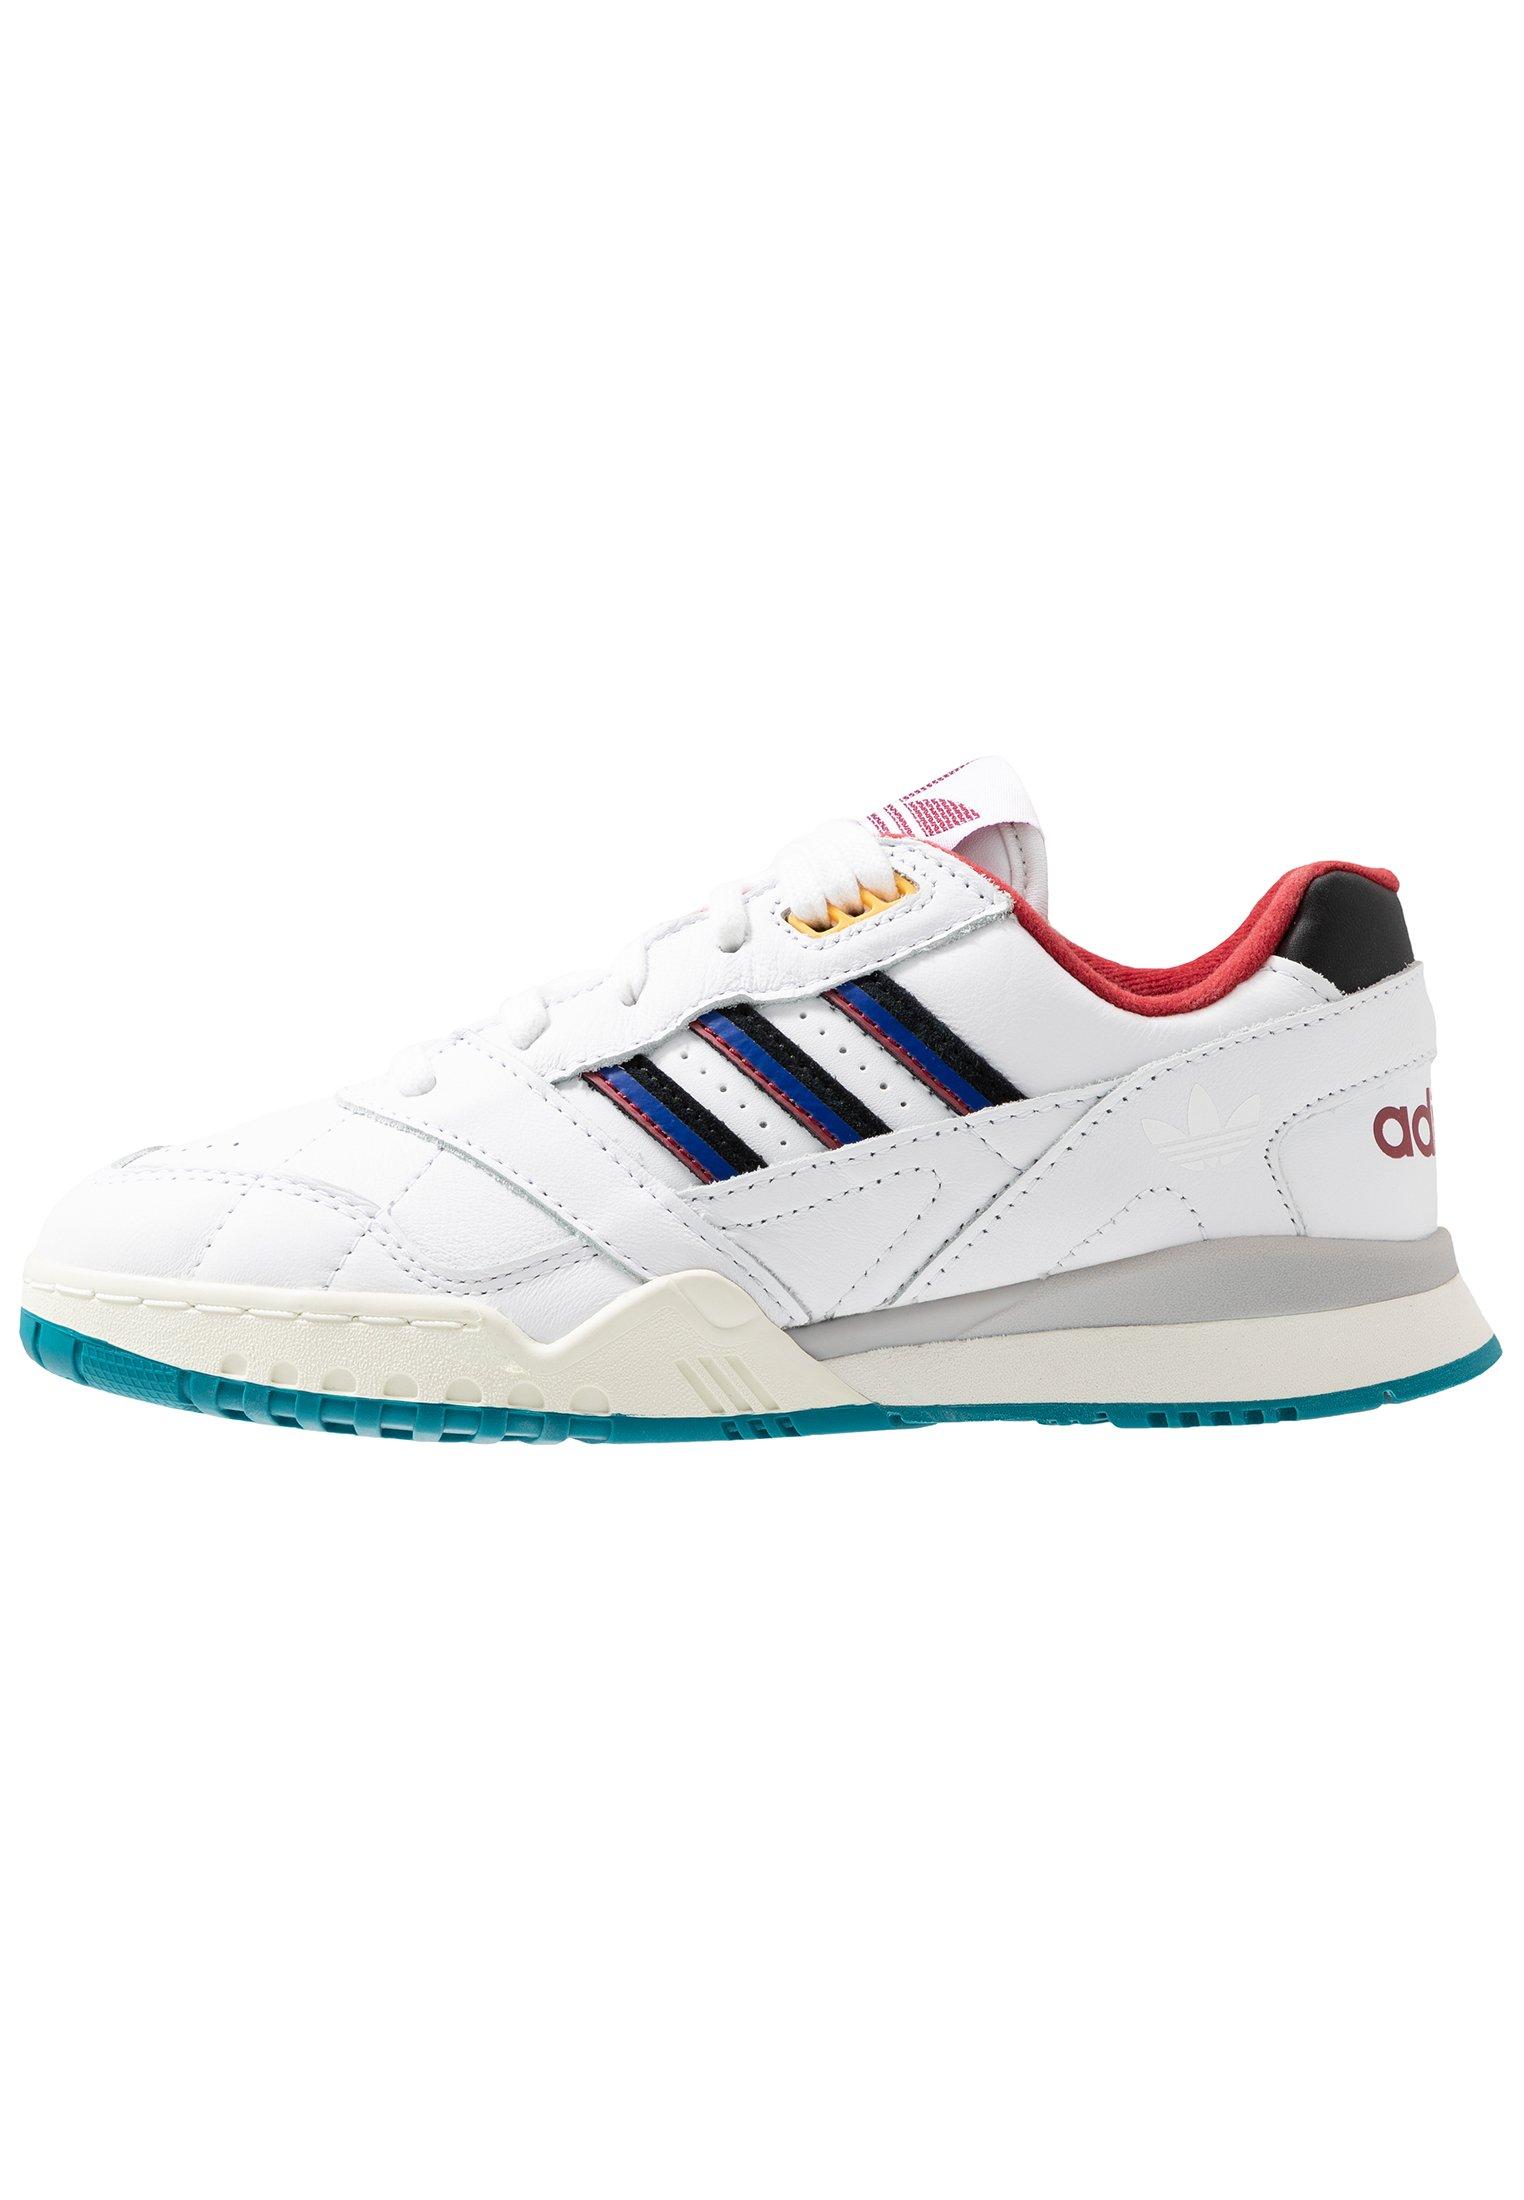 adidas Originals A.R. TRAINER - Sneakersy niskie - footwear white/blue/sky tint